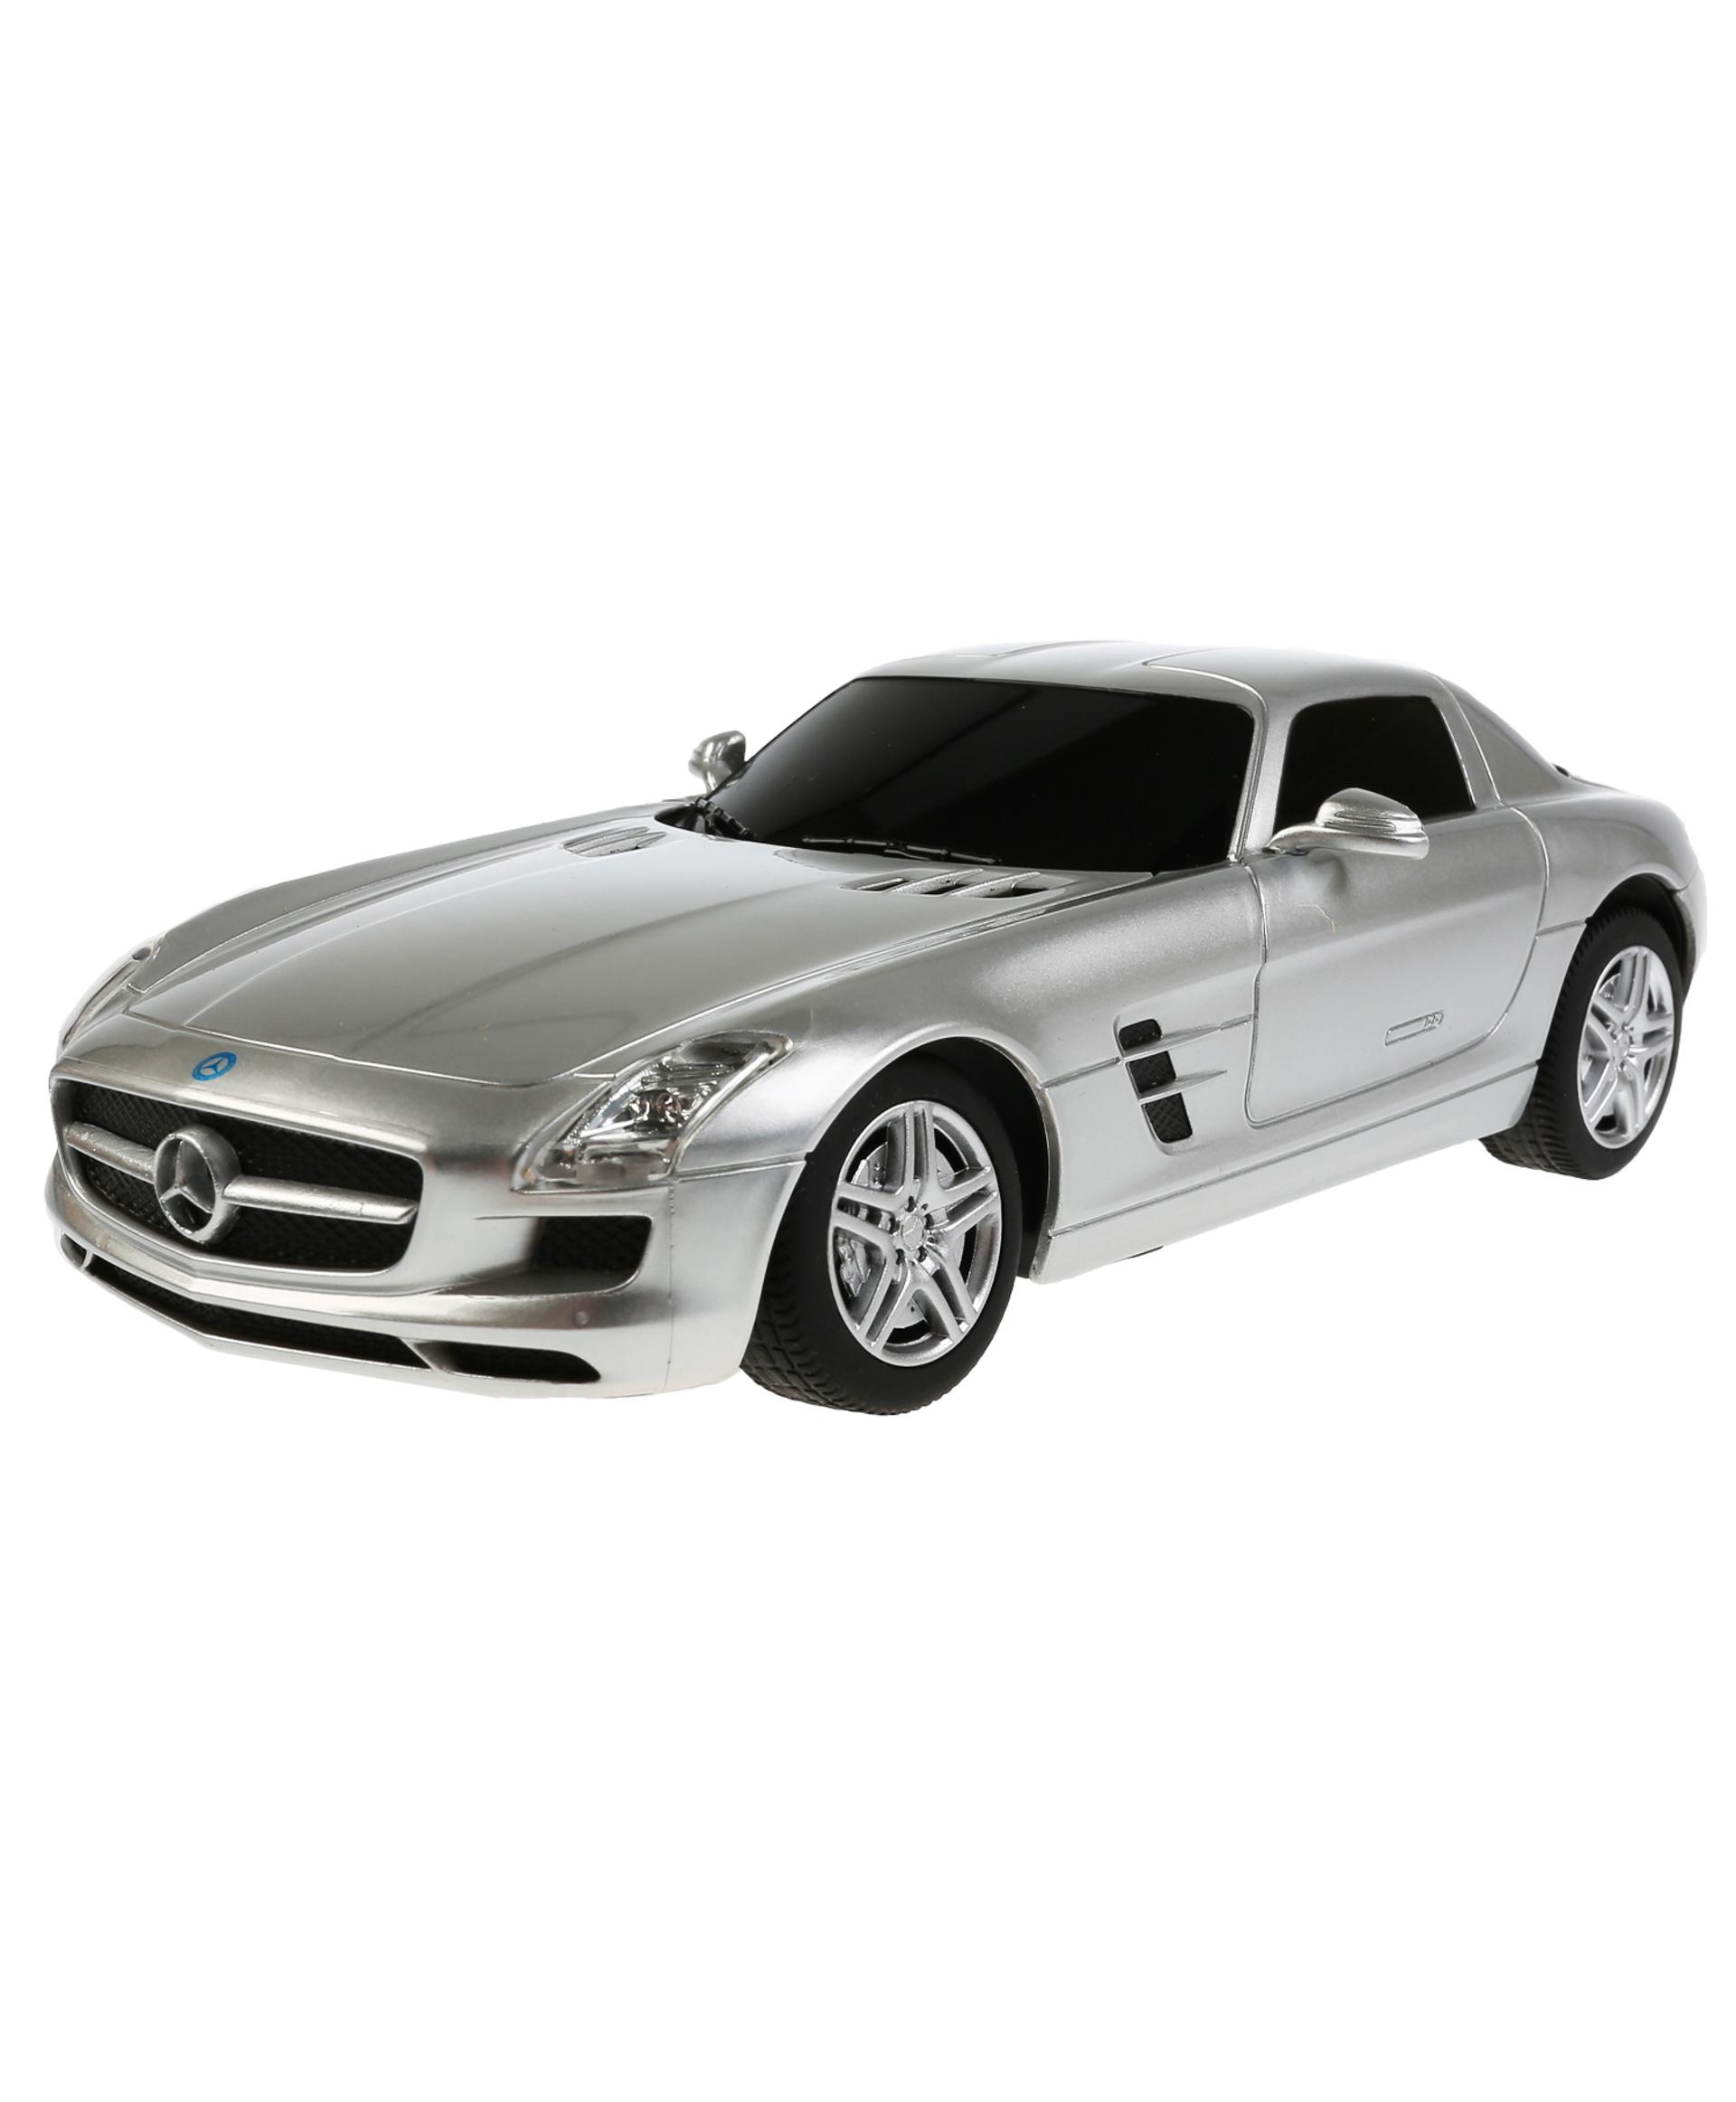 "Rastar Машина на радиоуправлении ""Mercedes SLS AMG"" 166934"